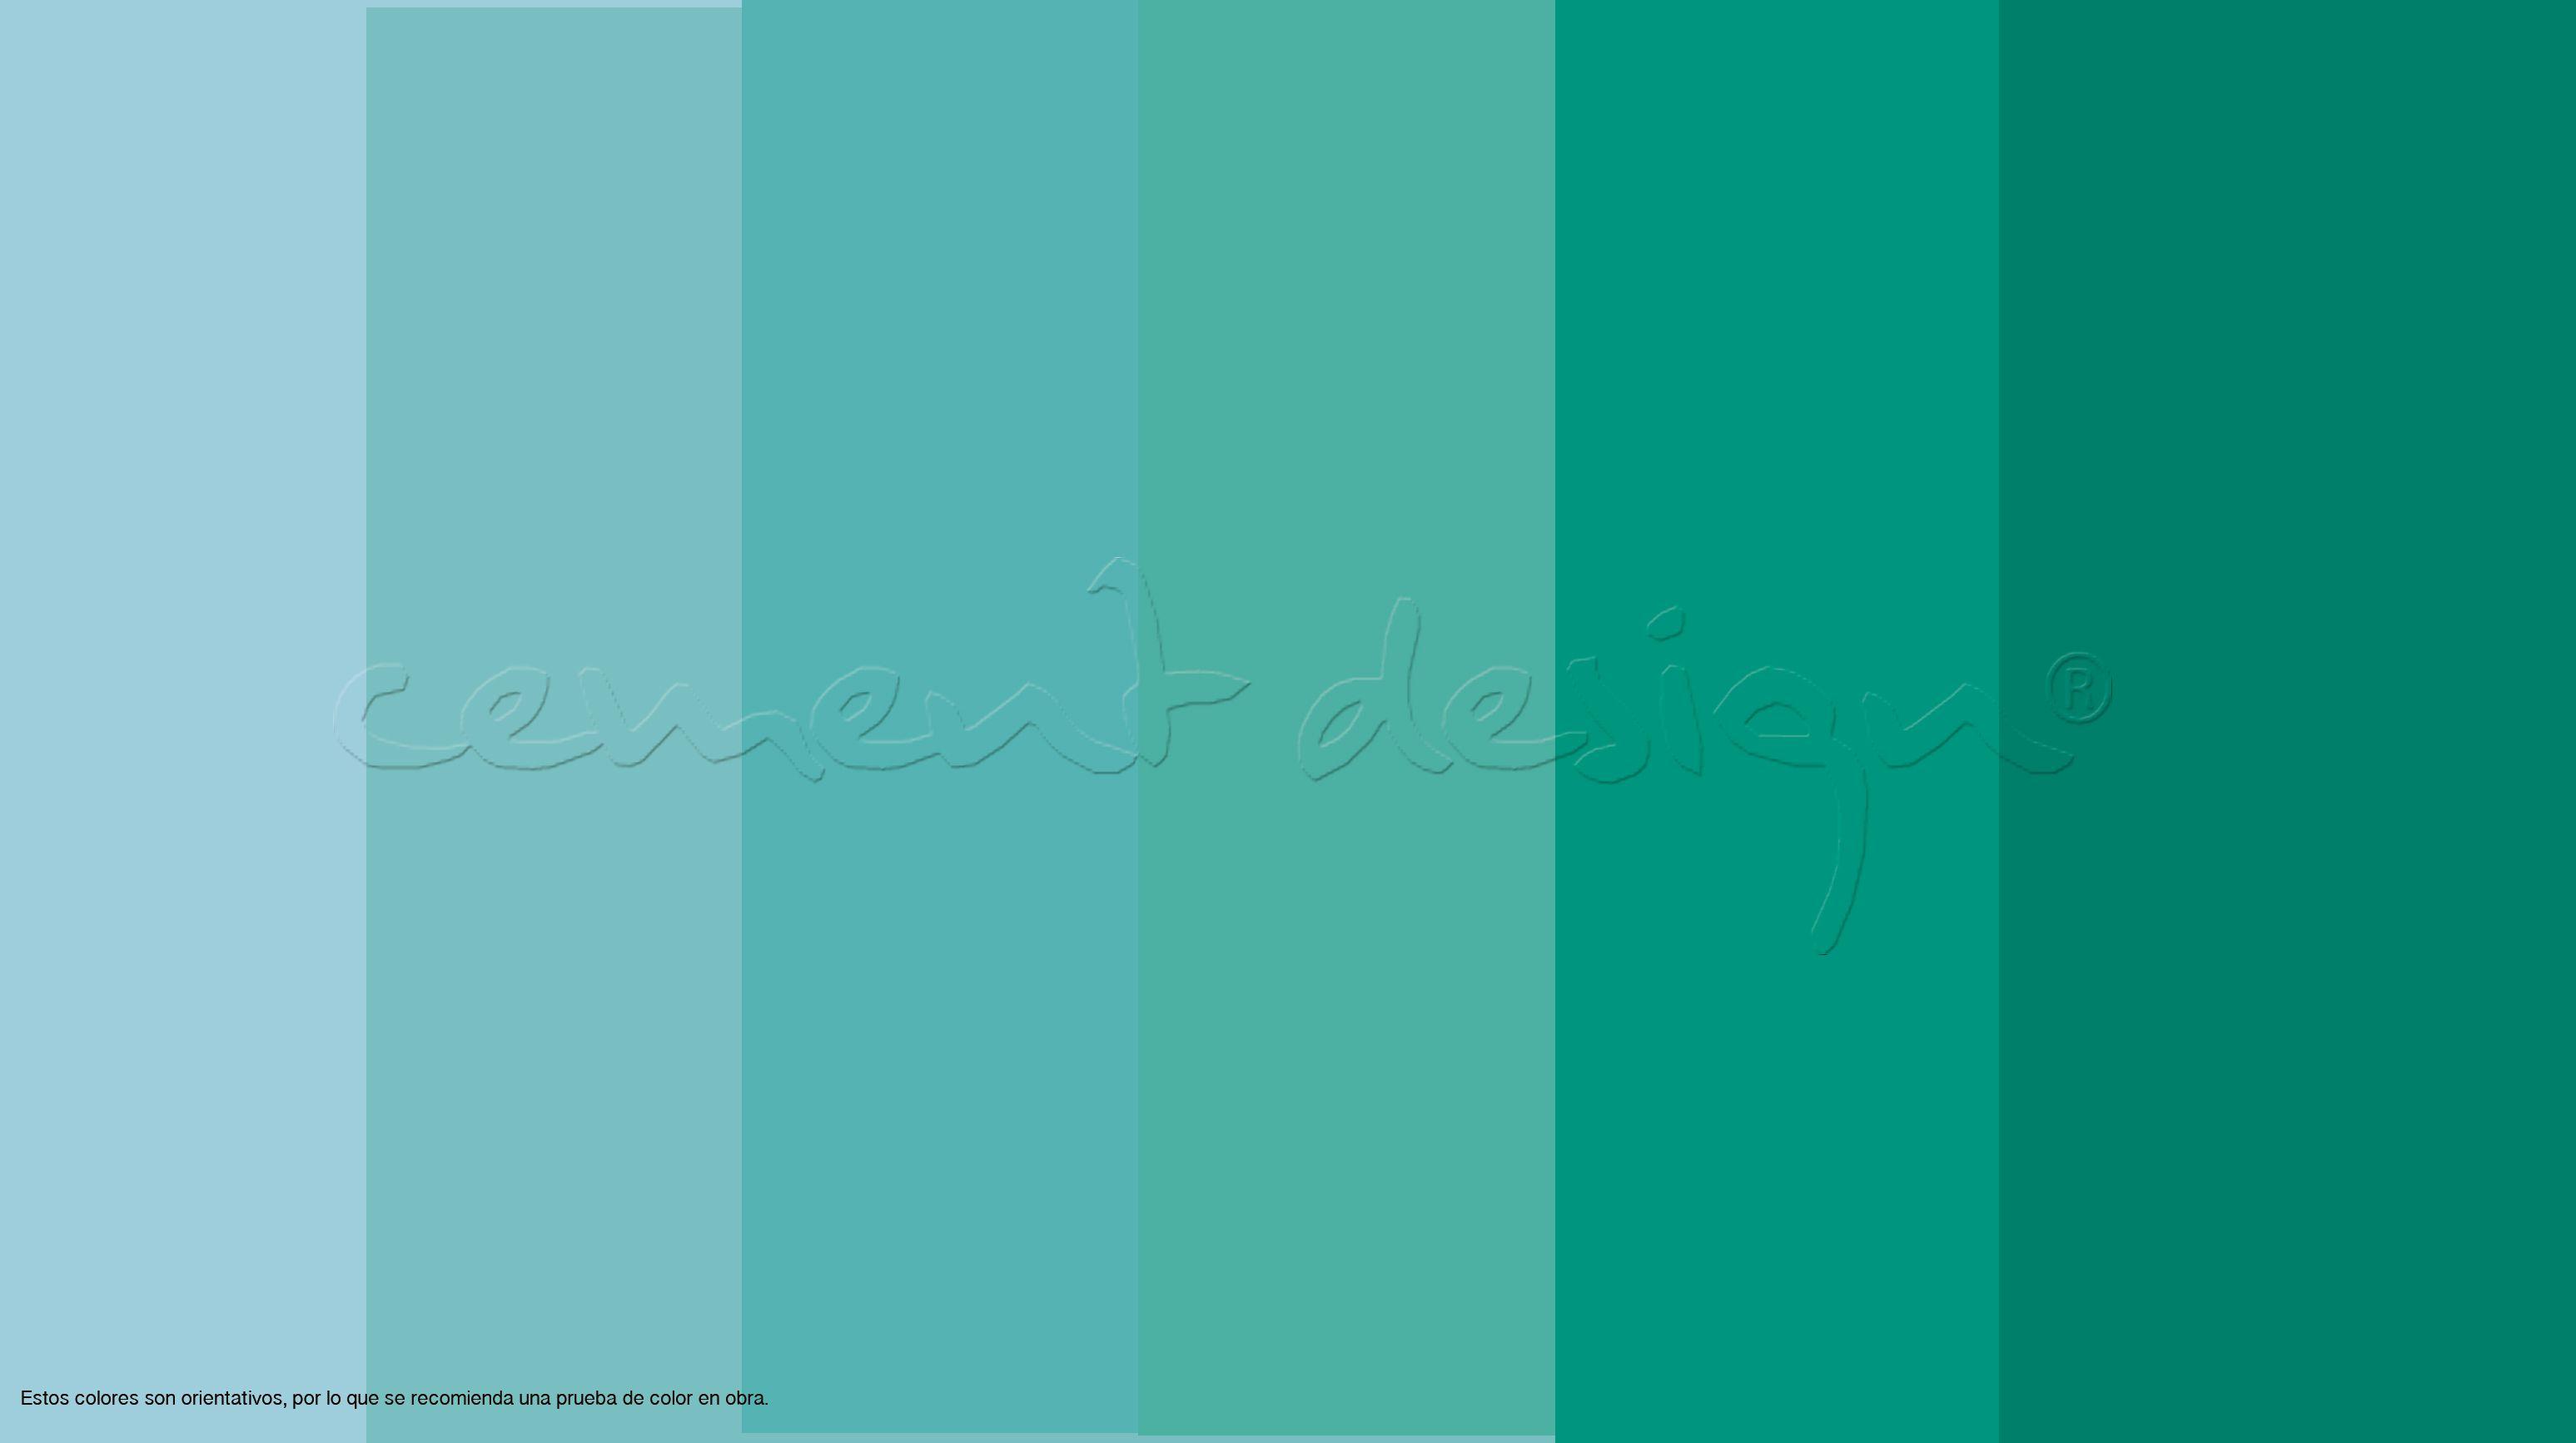 Turquesa Roto Blended Turquoise Turquesa Suave Light